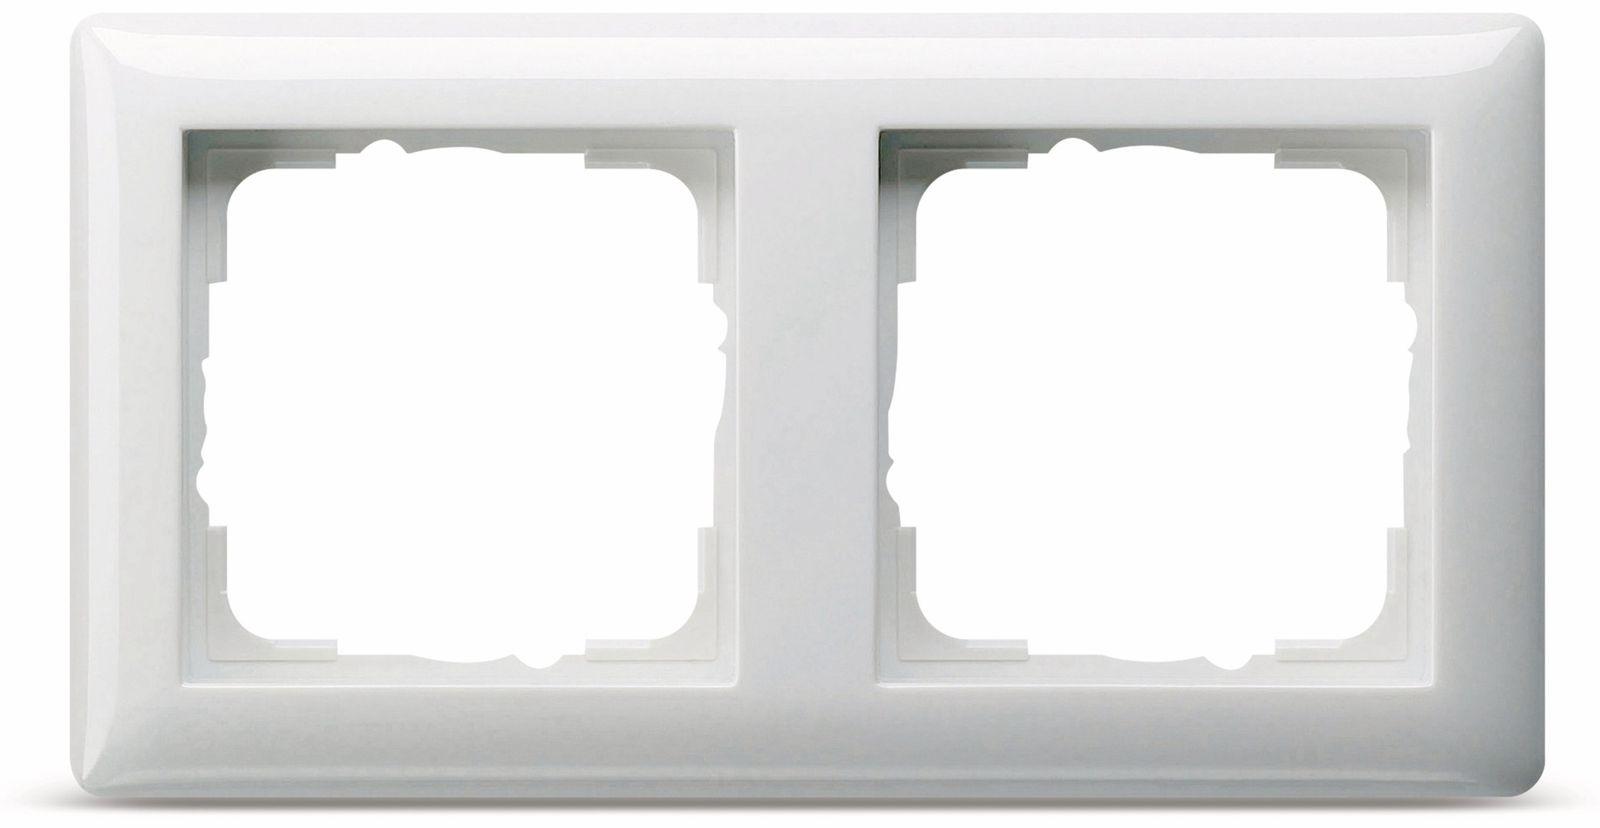 abdeckrahmen 2 fach gira standard 55 021203 reinwei. Black Bedroom Furniture Sets. Home Design Ideas